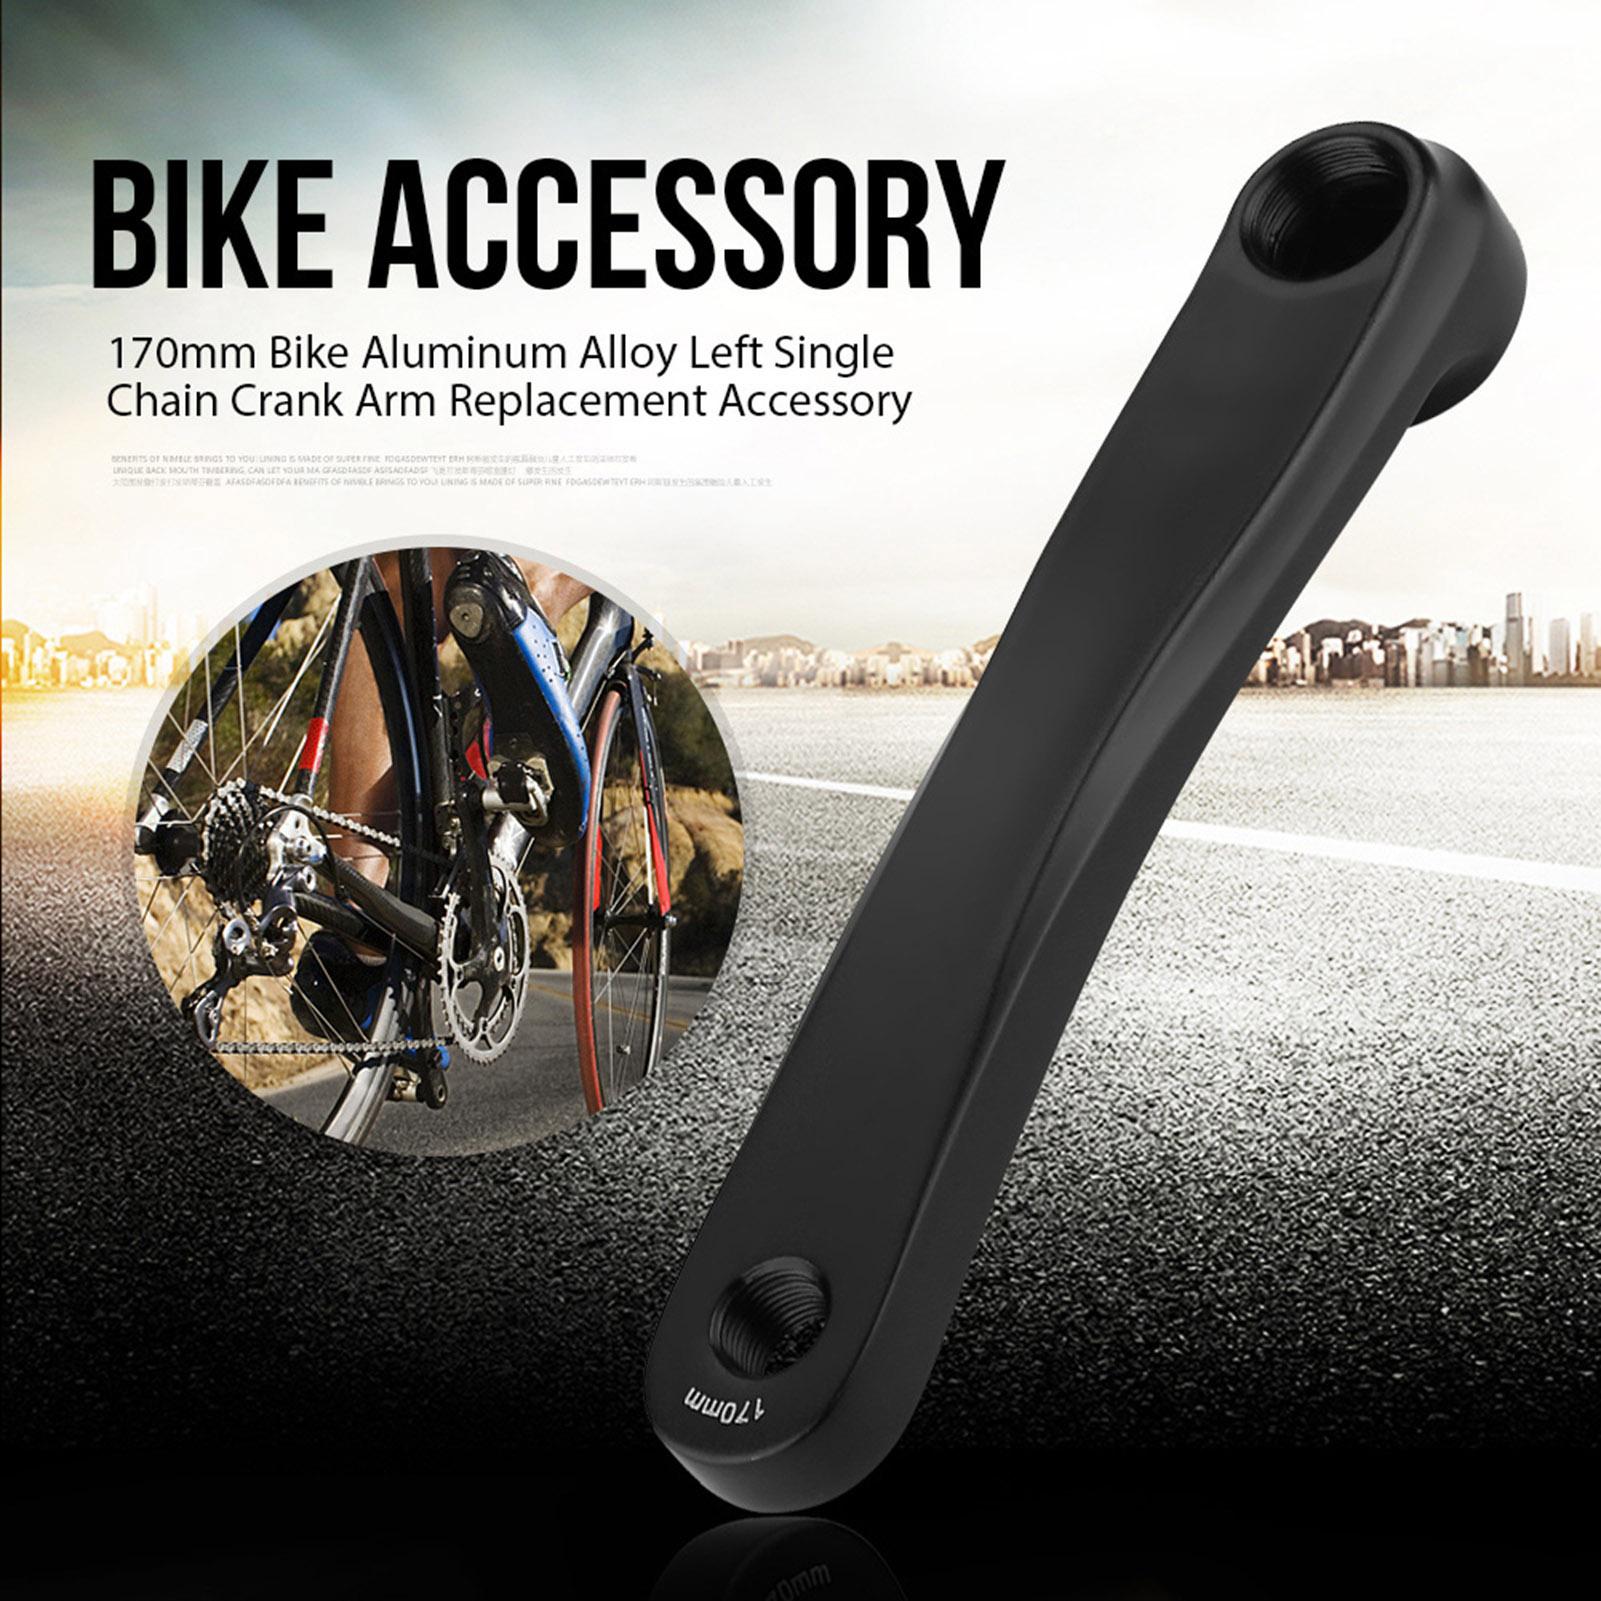 170mm-Bike-Aluminum-Alloy-Left-Single-Chain-Crank-Arm-Replacement-Accessory thumbnail 7